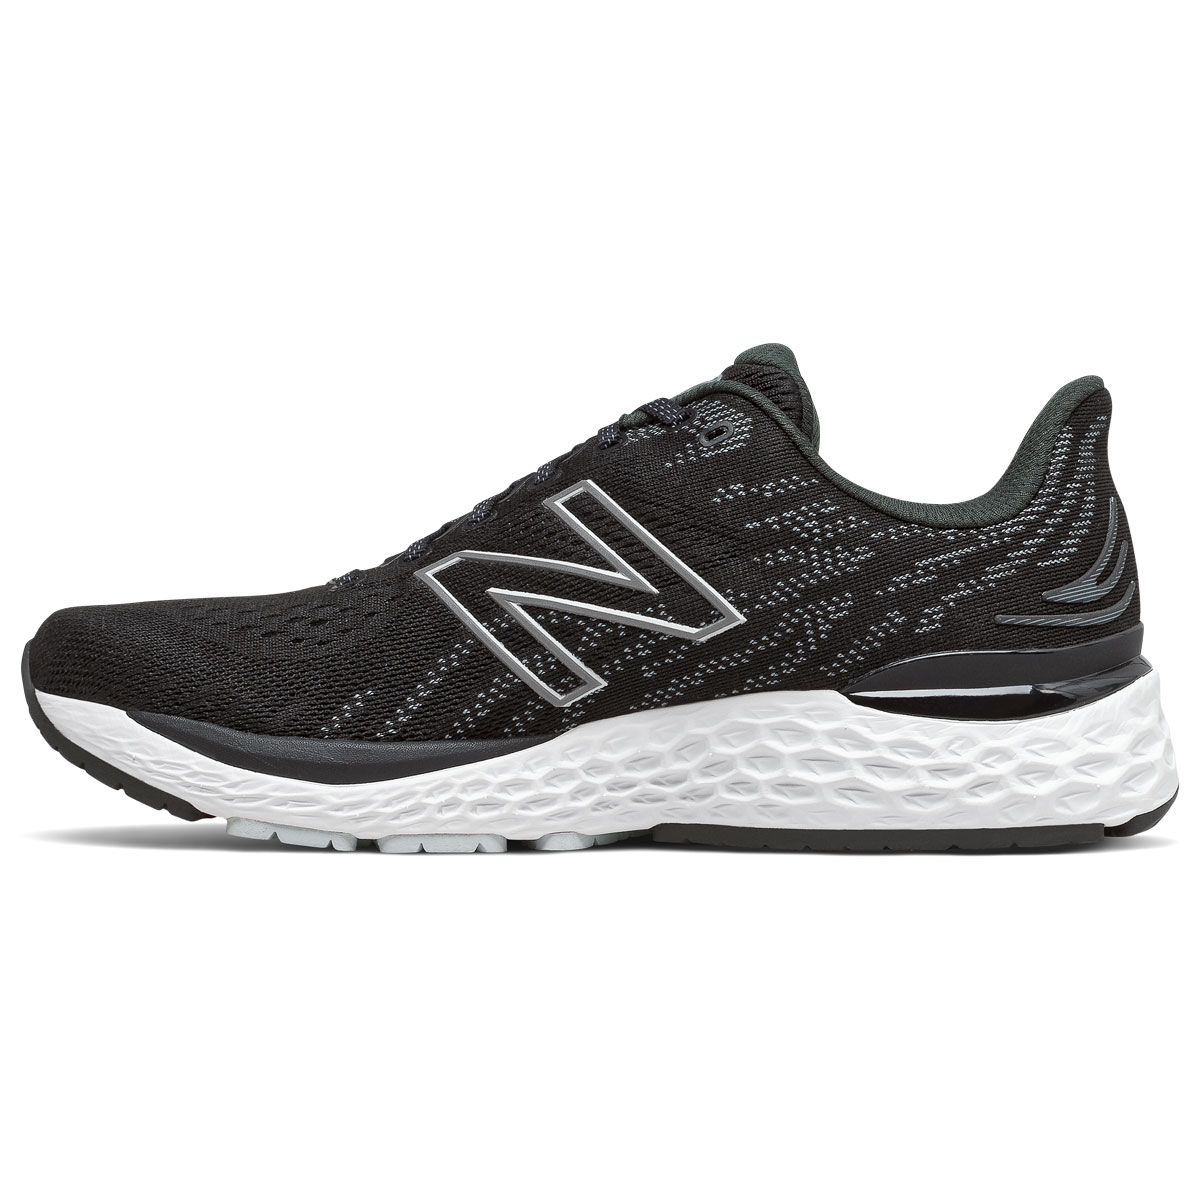 Men's New Balance Fresh Foam 880v11 Running Shoe - Color: Black/Cyclone - Size: 6 - Width: Wide, Black/Cyclone, large, image 2